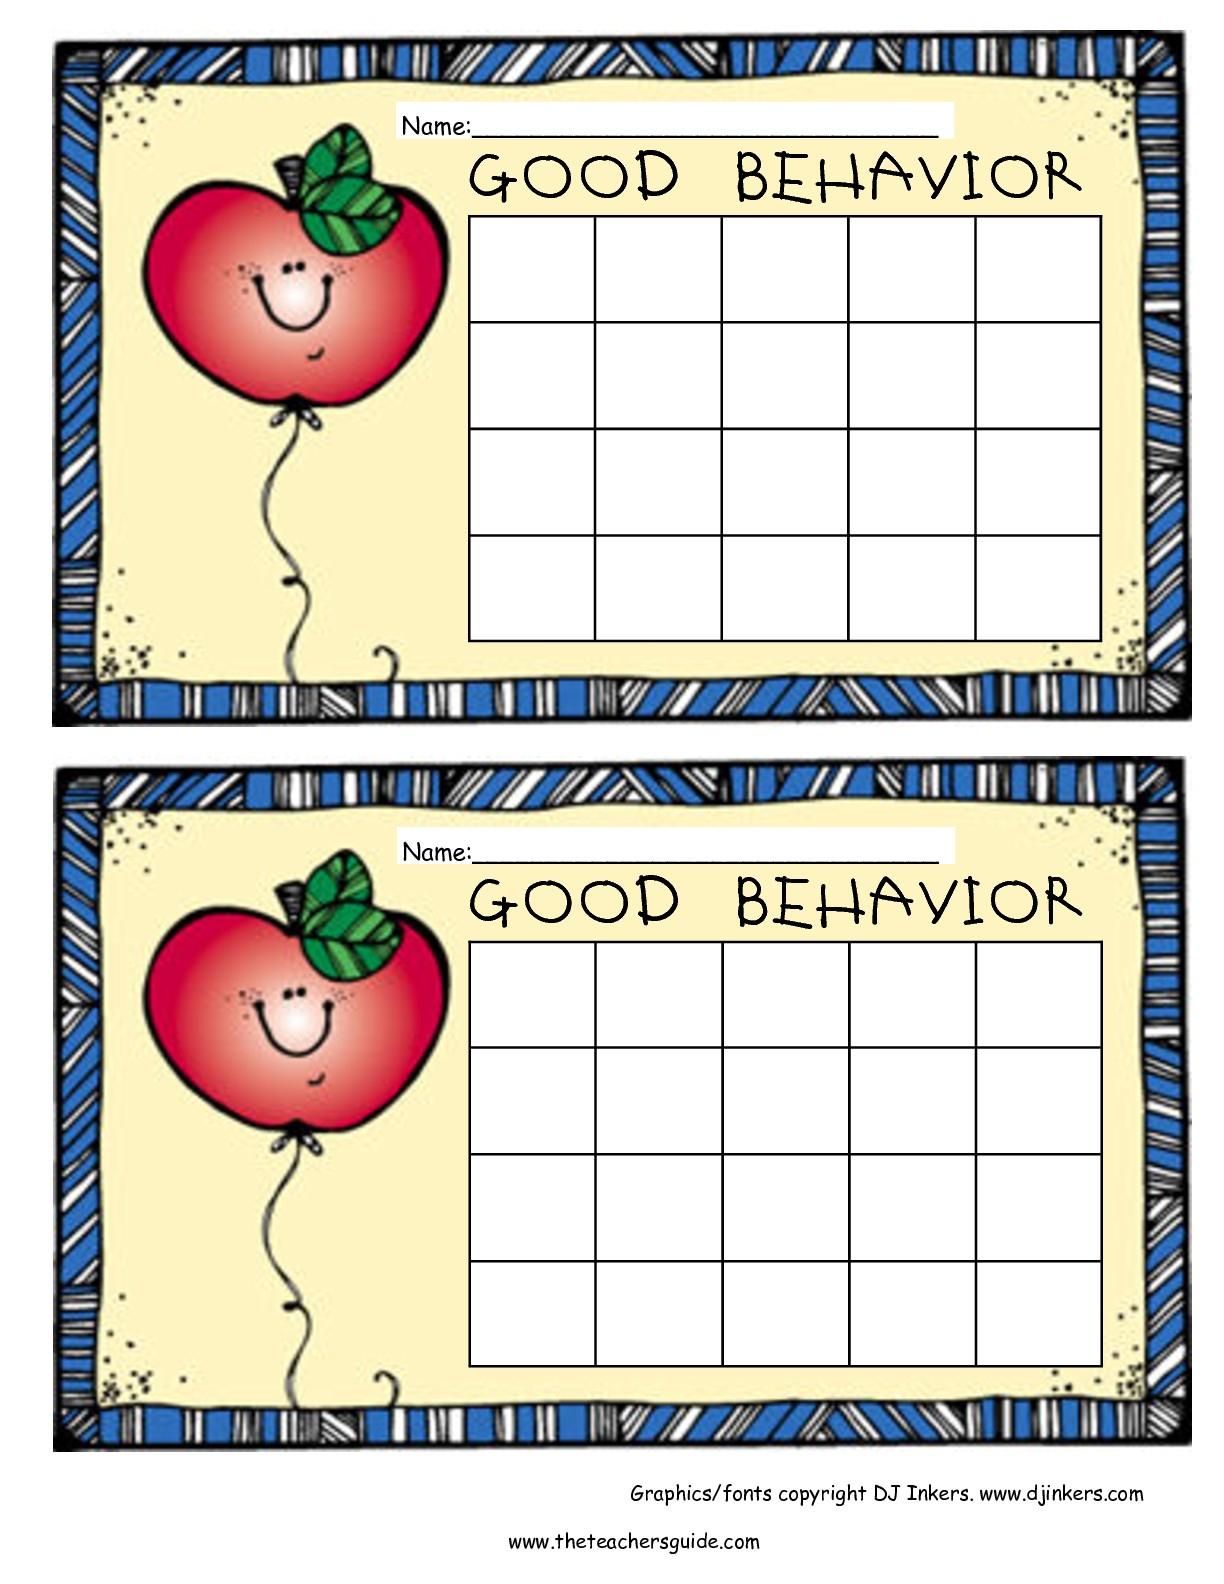 Free Printable Reward And Incentive Charts - Free Printable Behavior Charts